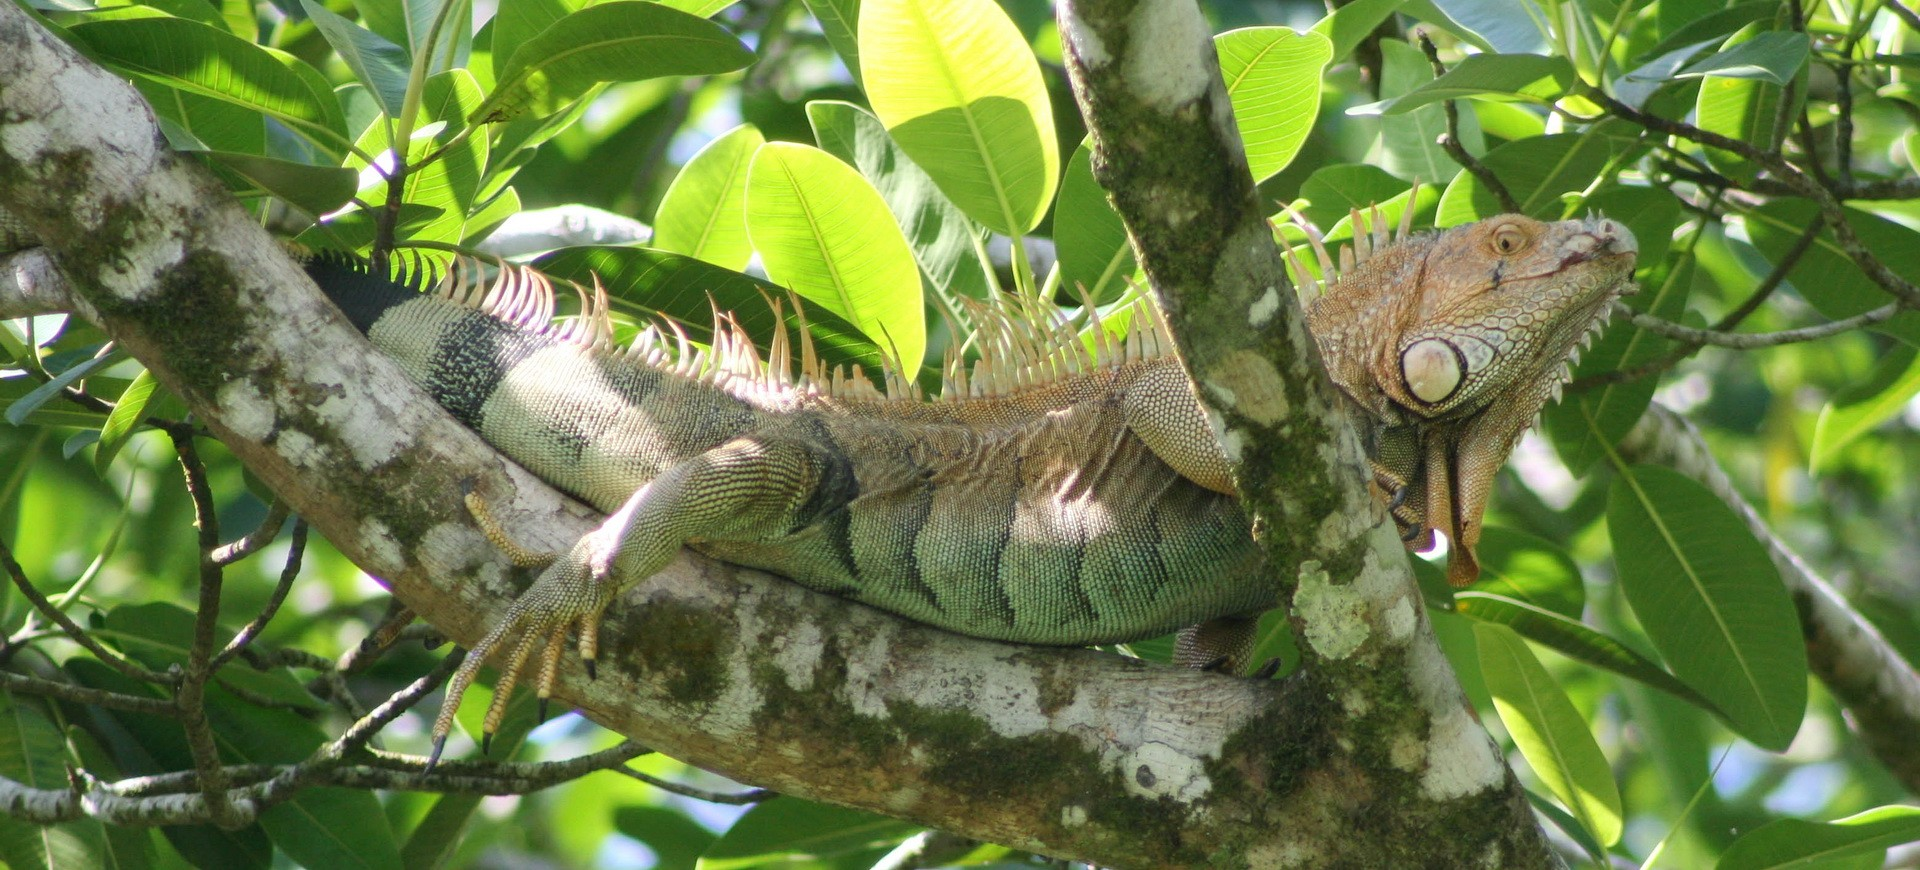 Costa Rica Rincon de la Vieja Caméléon